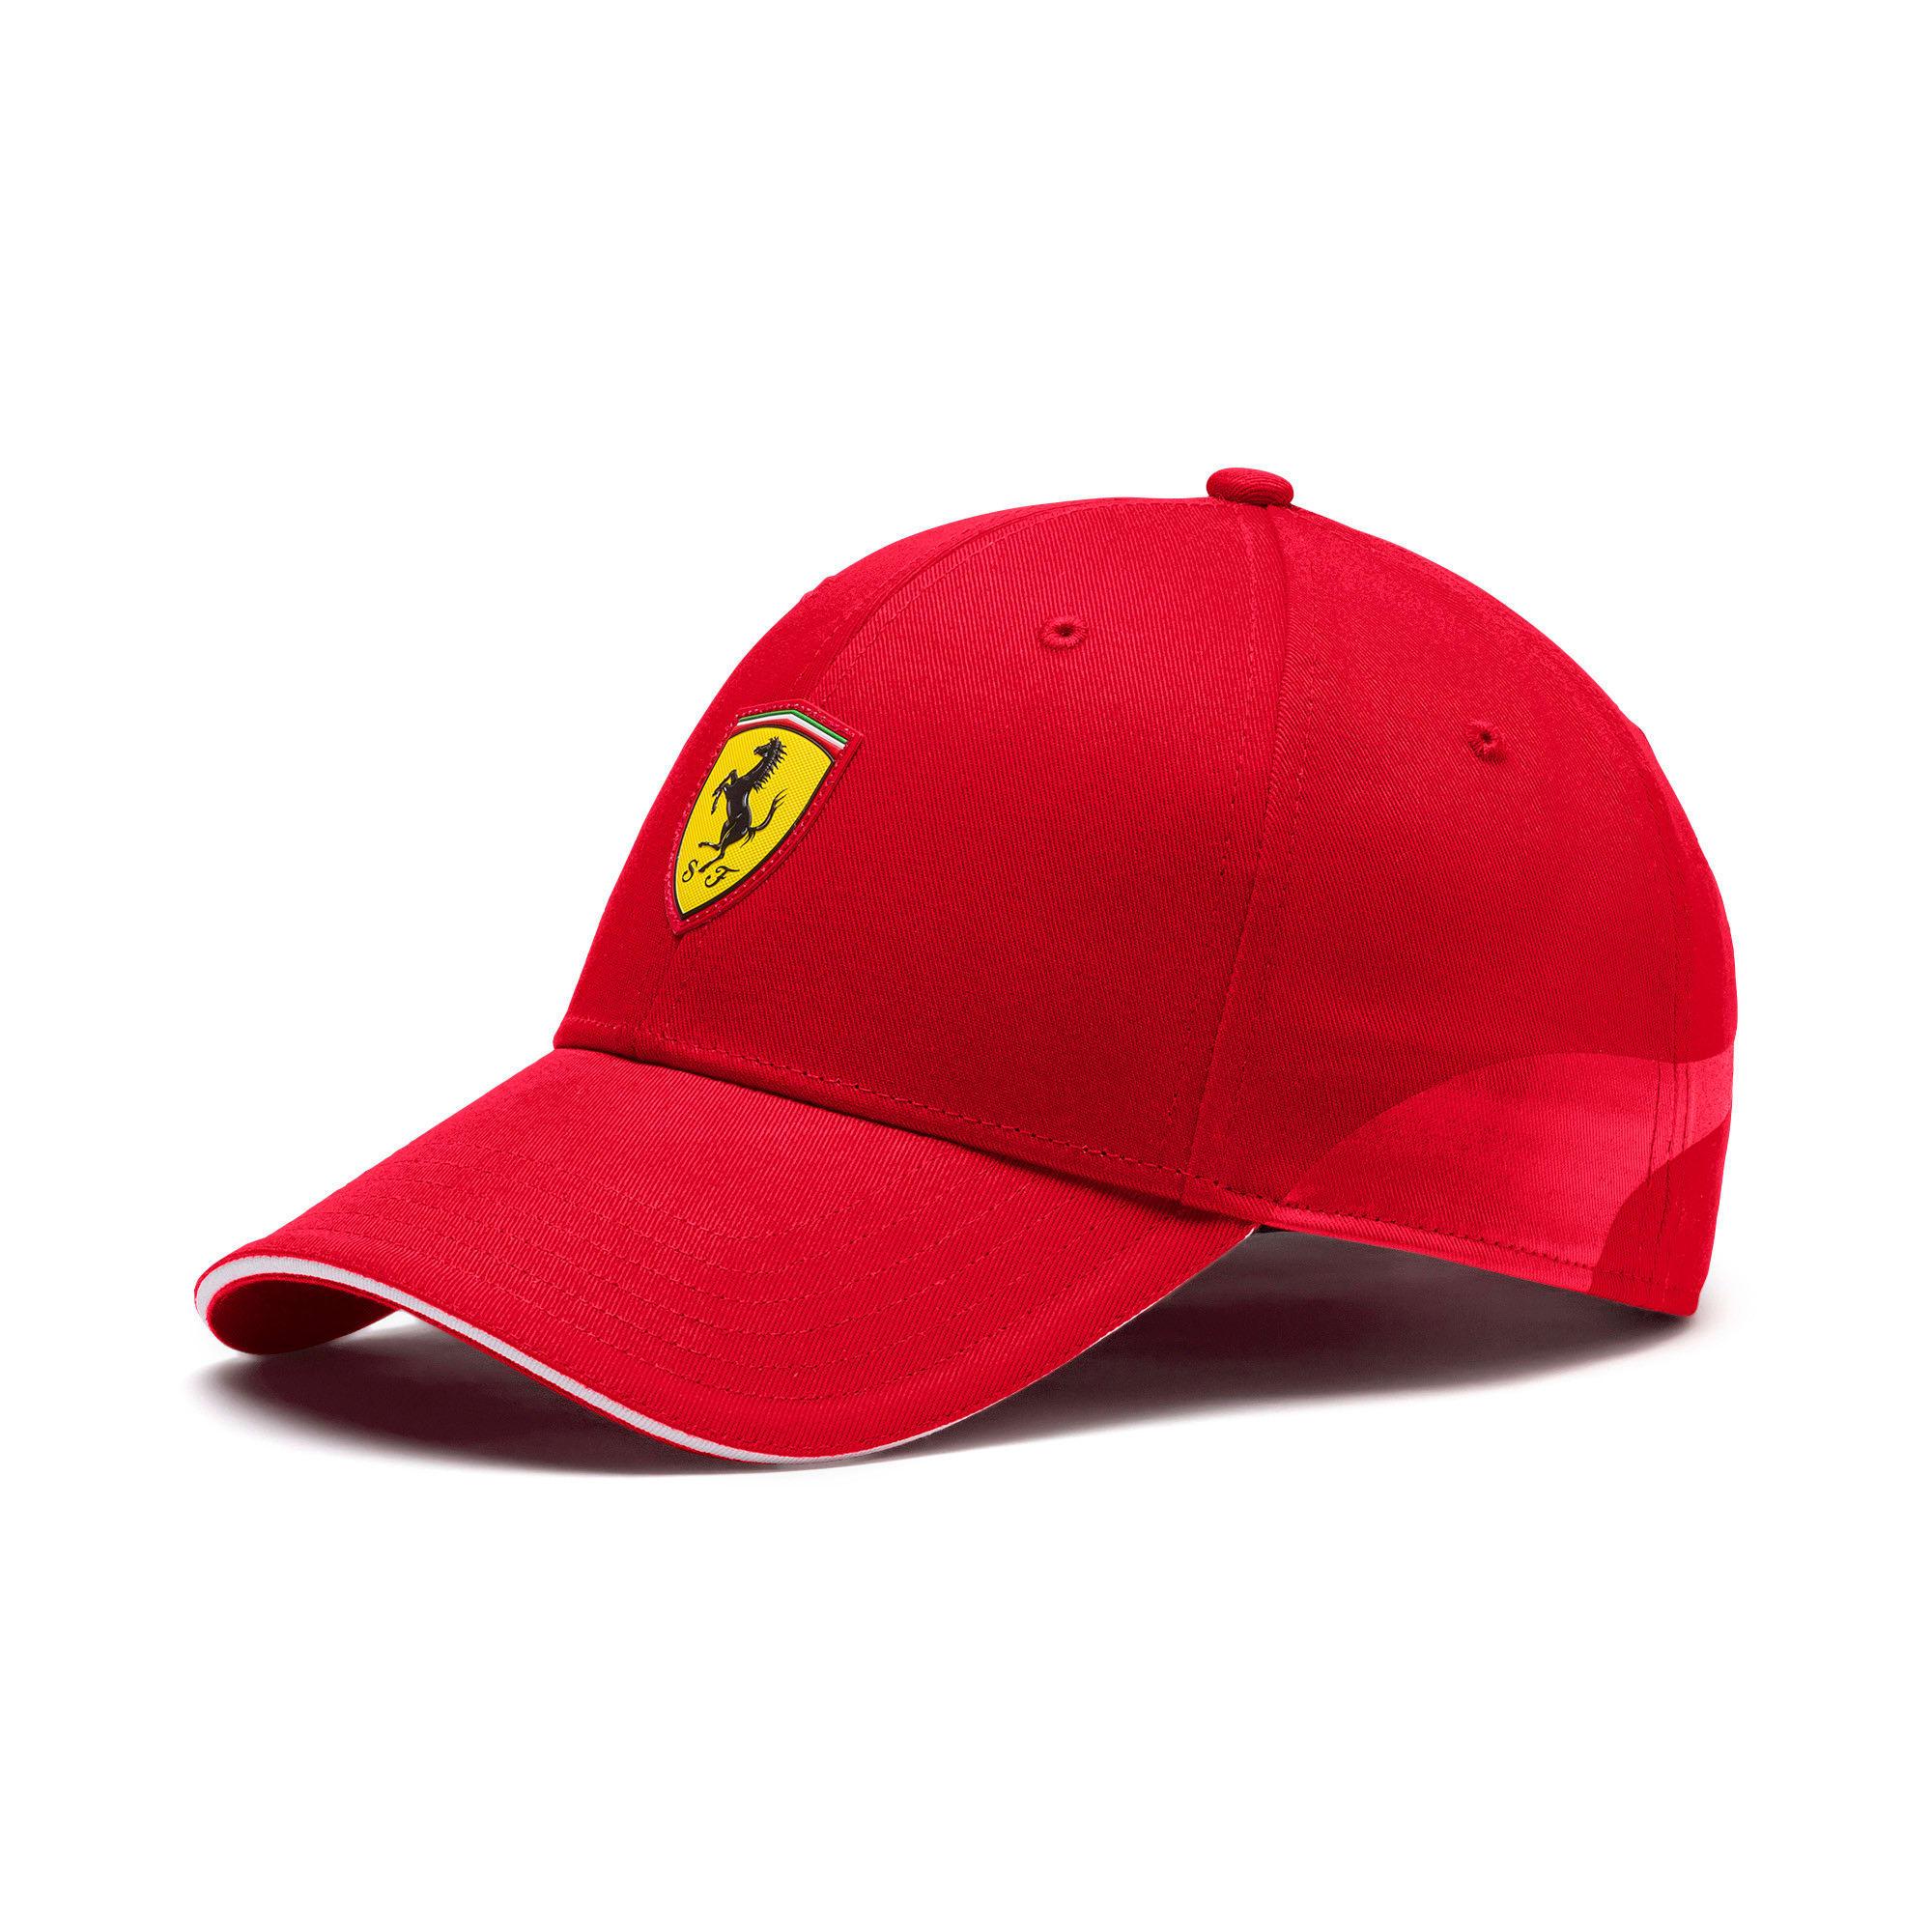 Thumbnail 1 of Ferrari Fanwear Cap, Rosso Corsa, medium